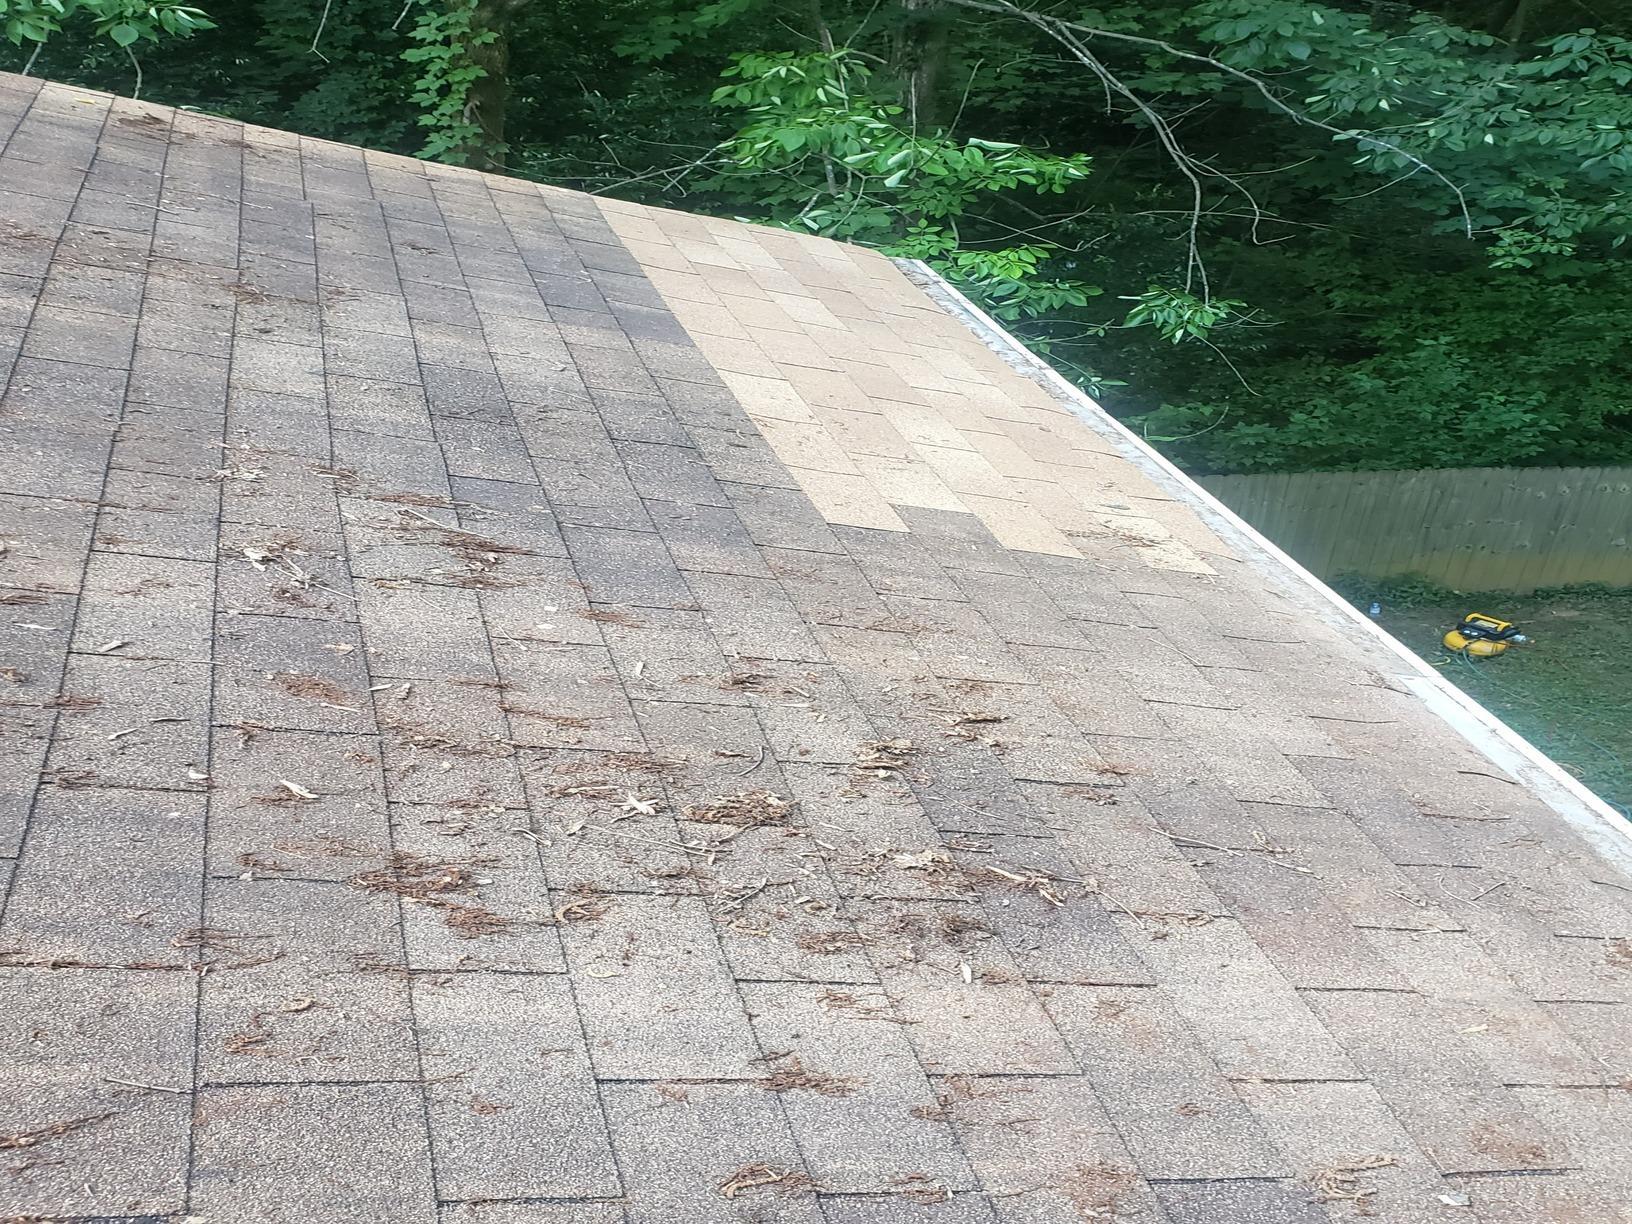 Roof and soffit repair in Atlanta, GA - After Photo